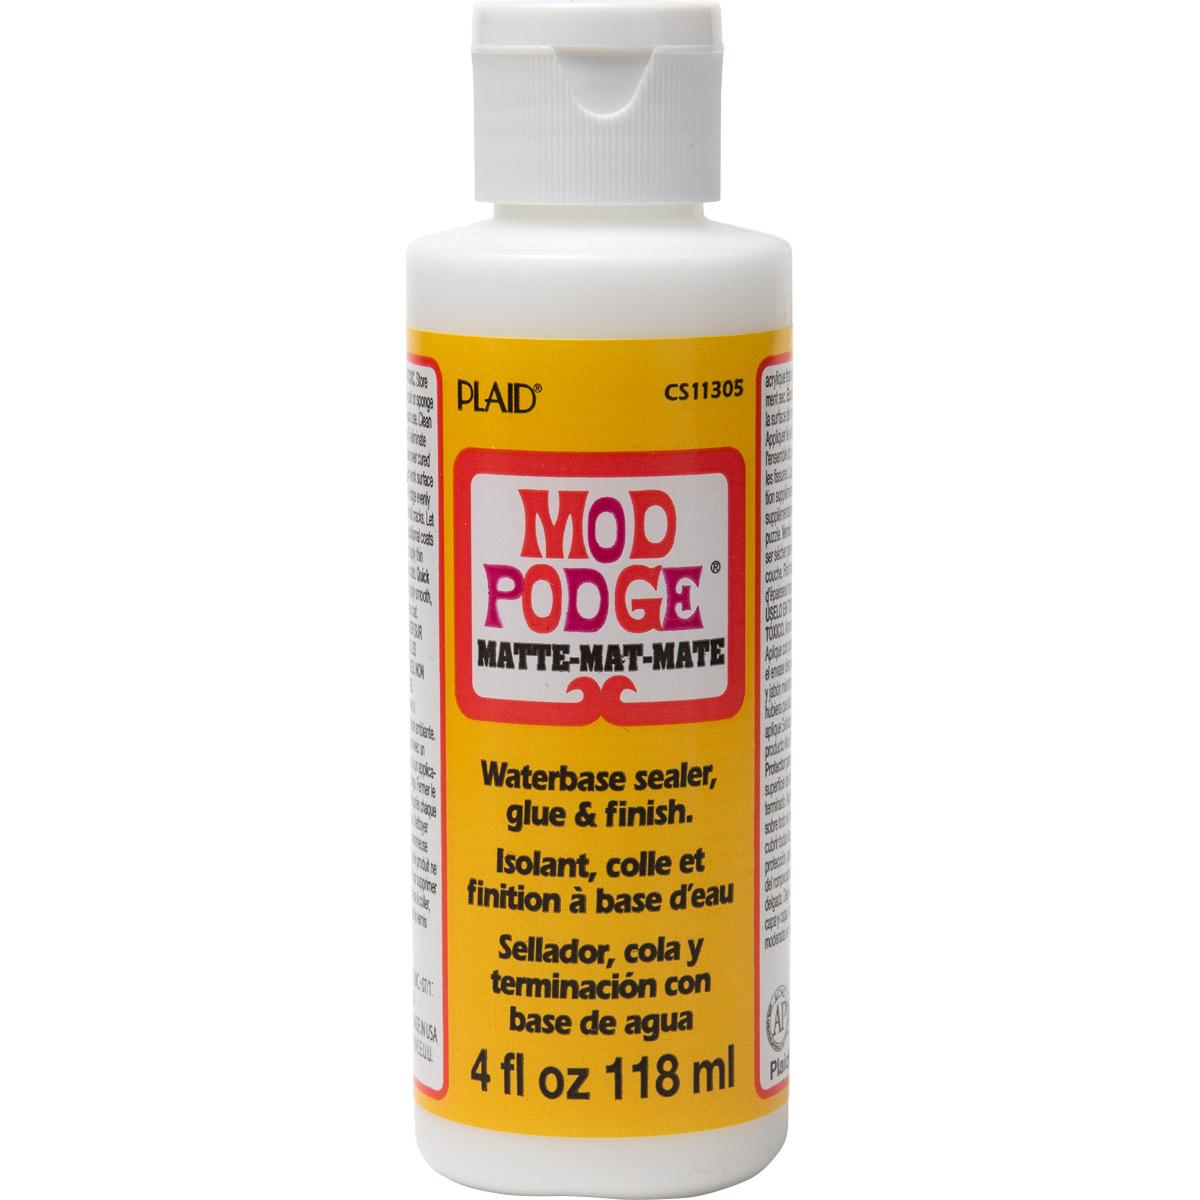 Mod Podge ® Matte, 4 oz. - CS11305